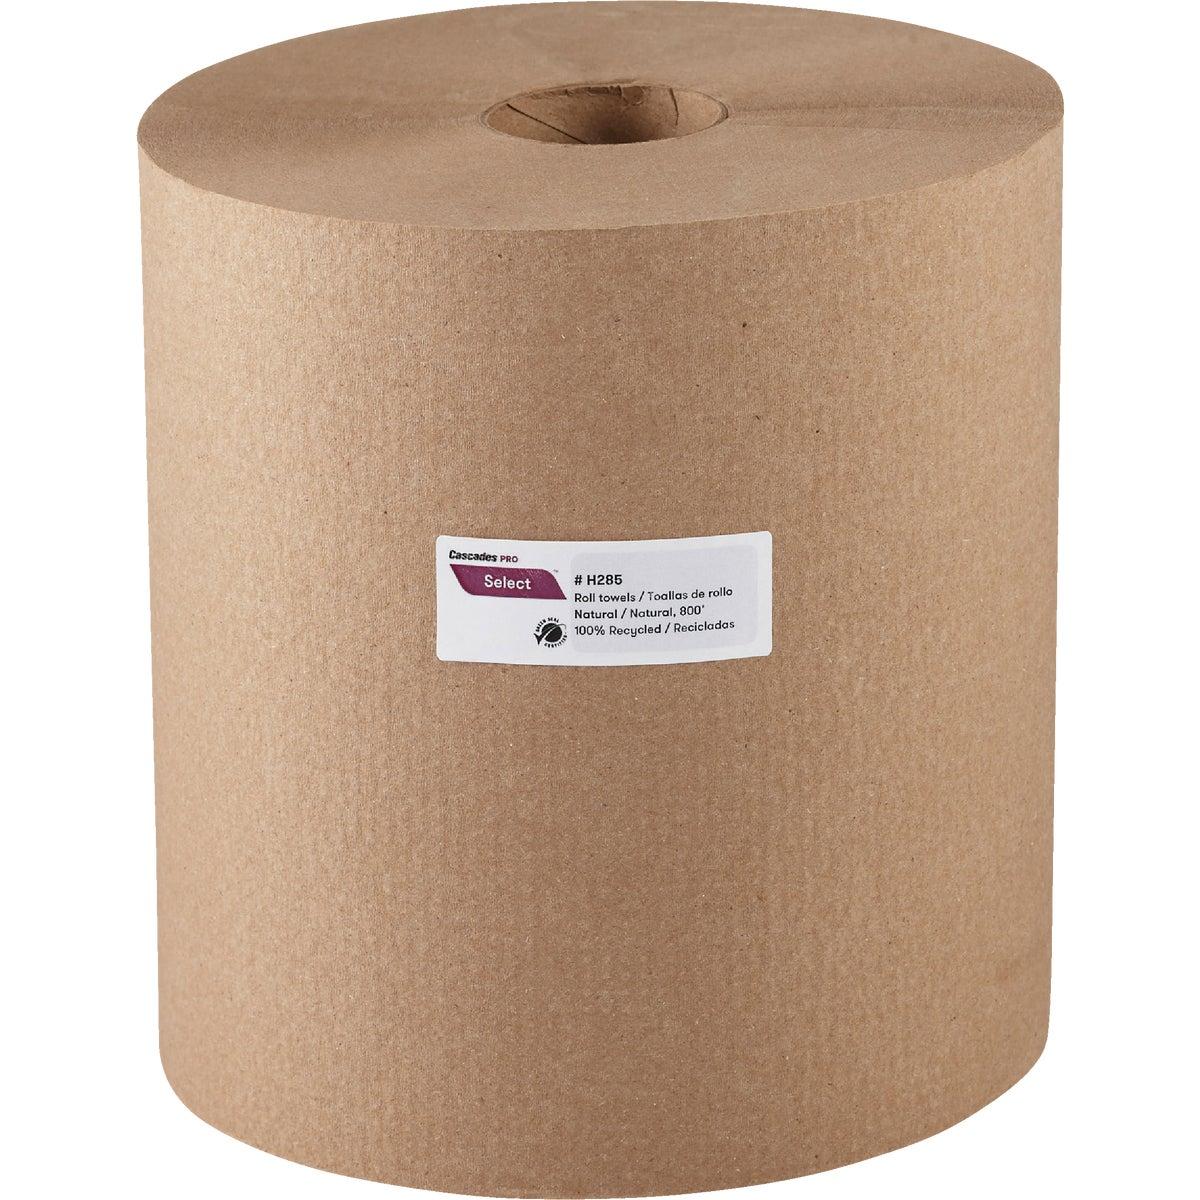 Cascades Pro Select Hard Roll Towel